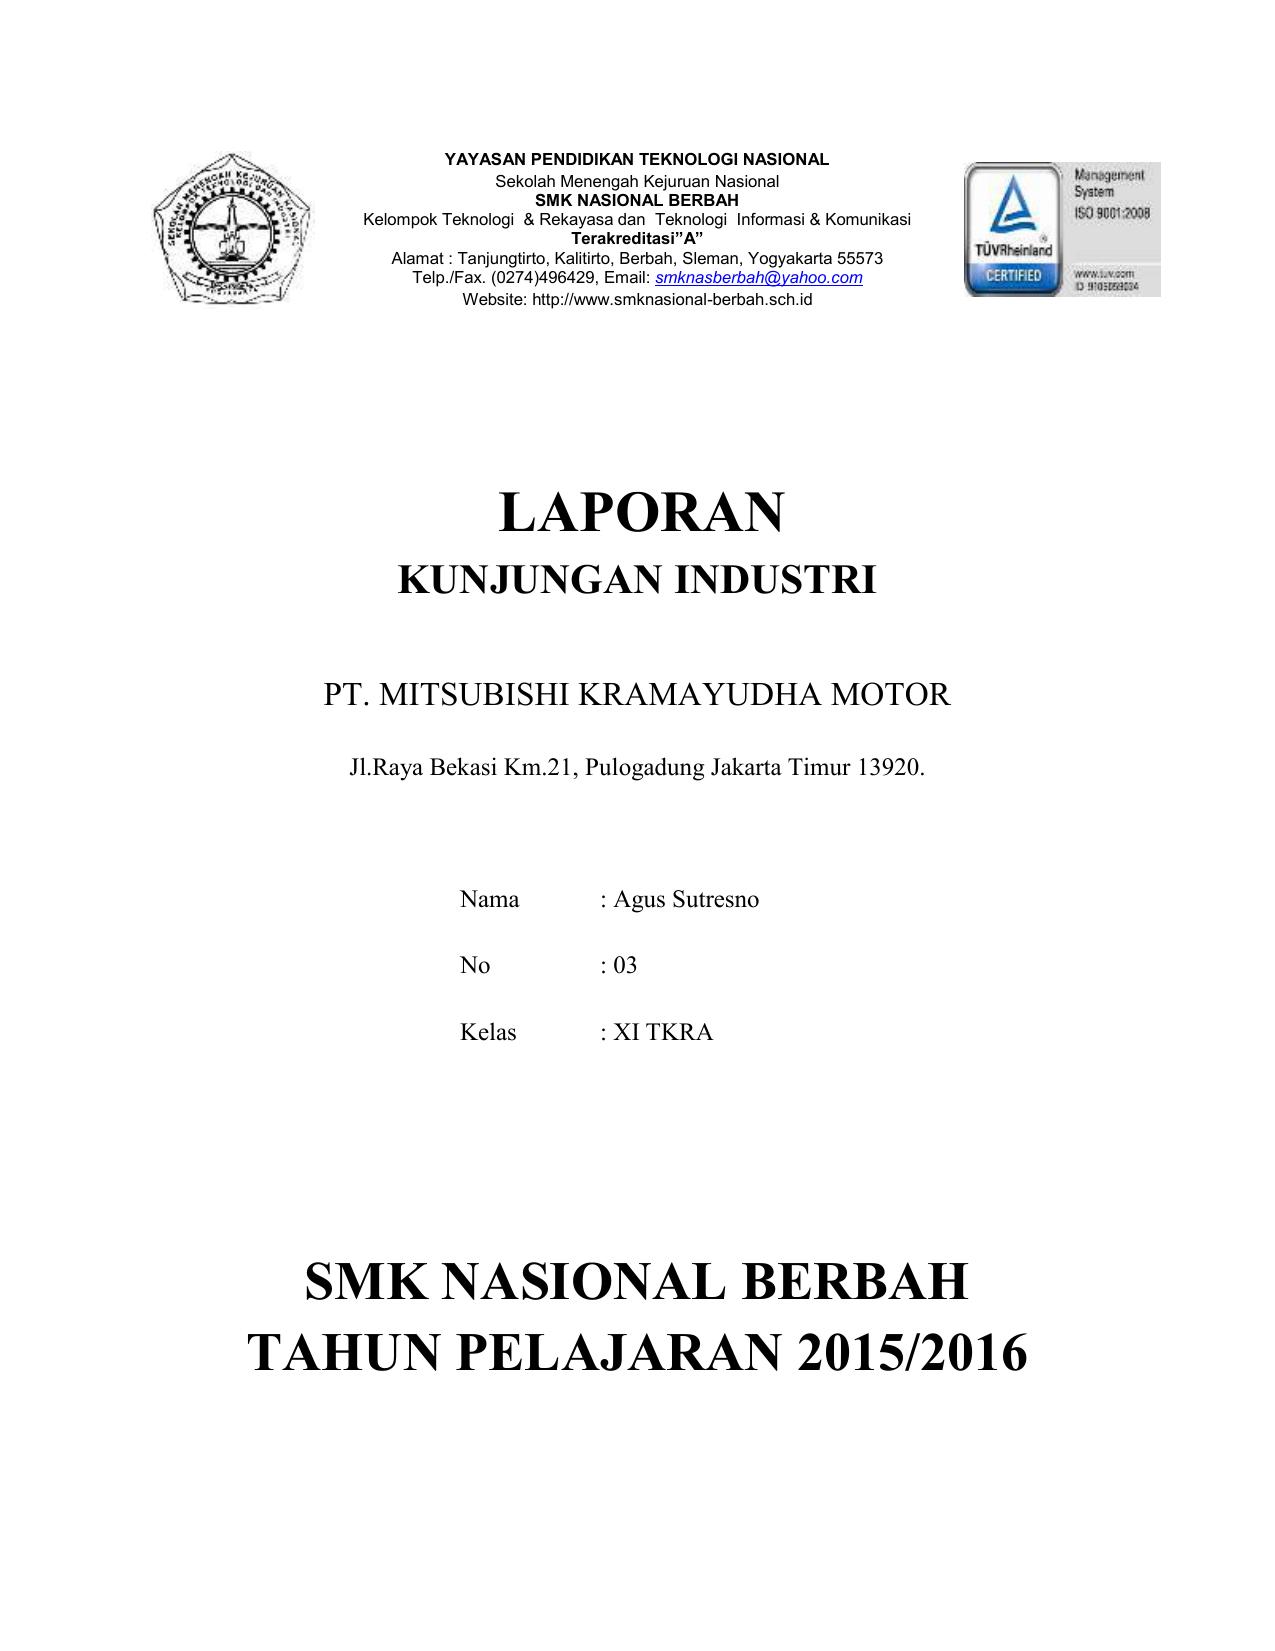 Contoh Laporan Kunjungan Industri Smk Tkj Kumpulan Contoh Laporan